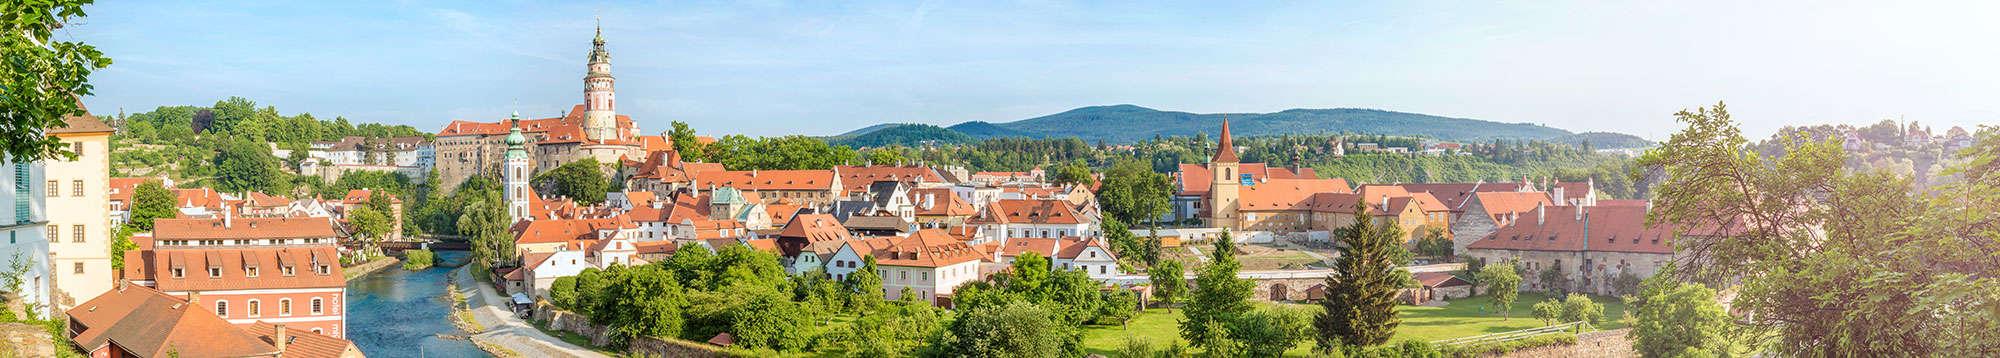 Escapadas fin de semana en República Checa